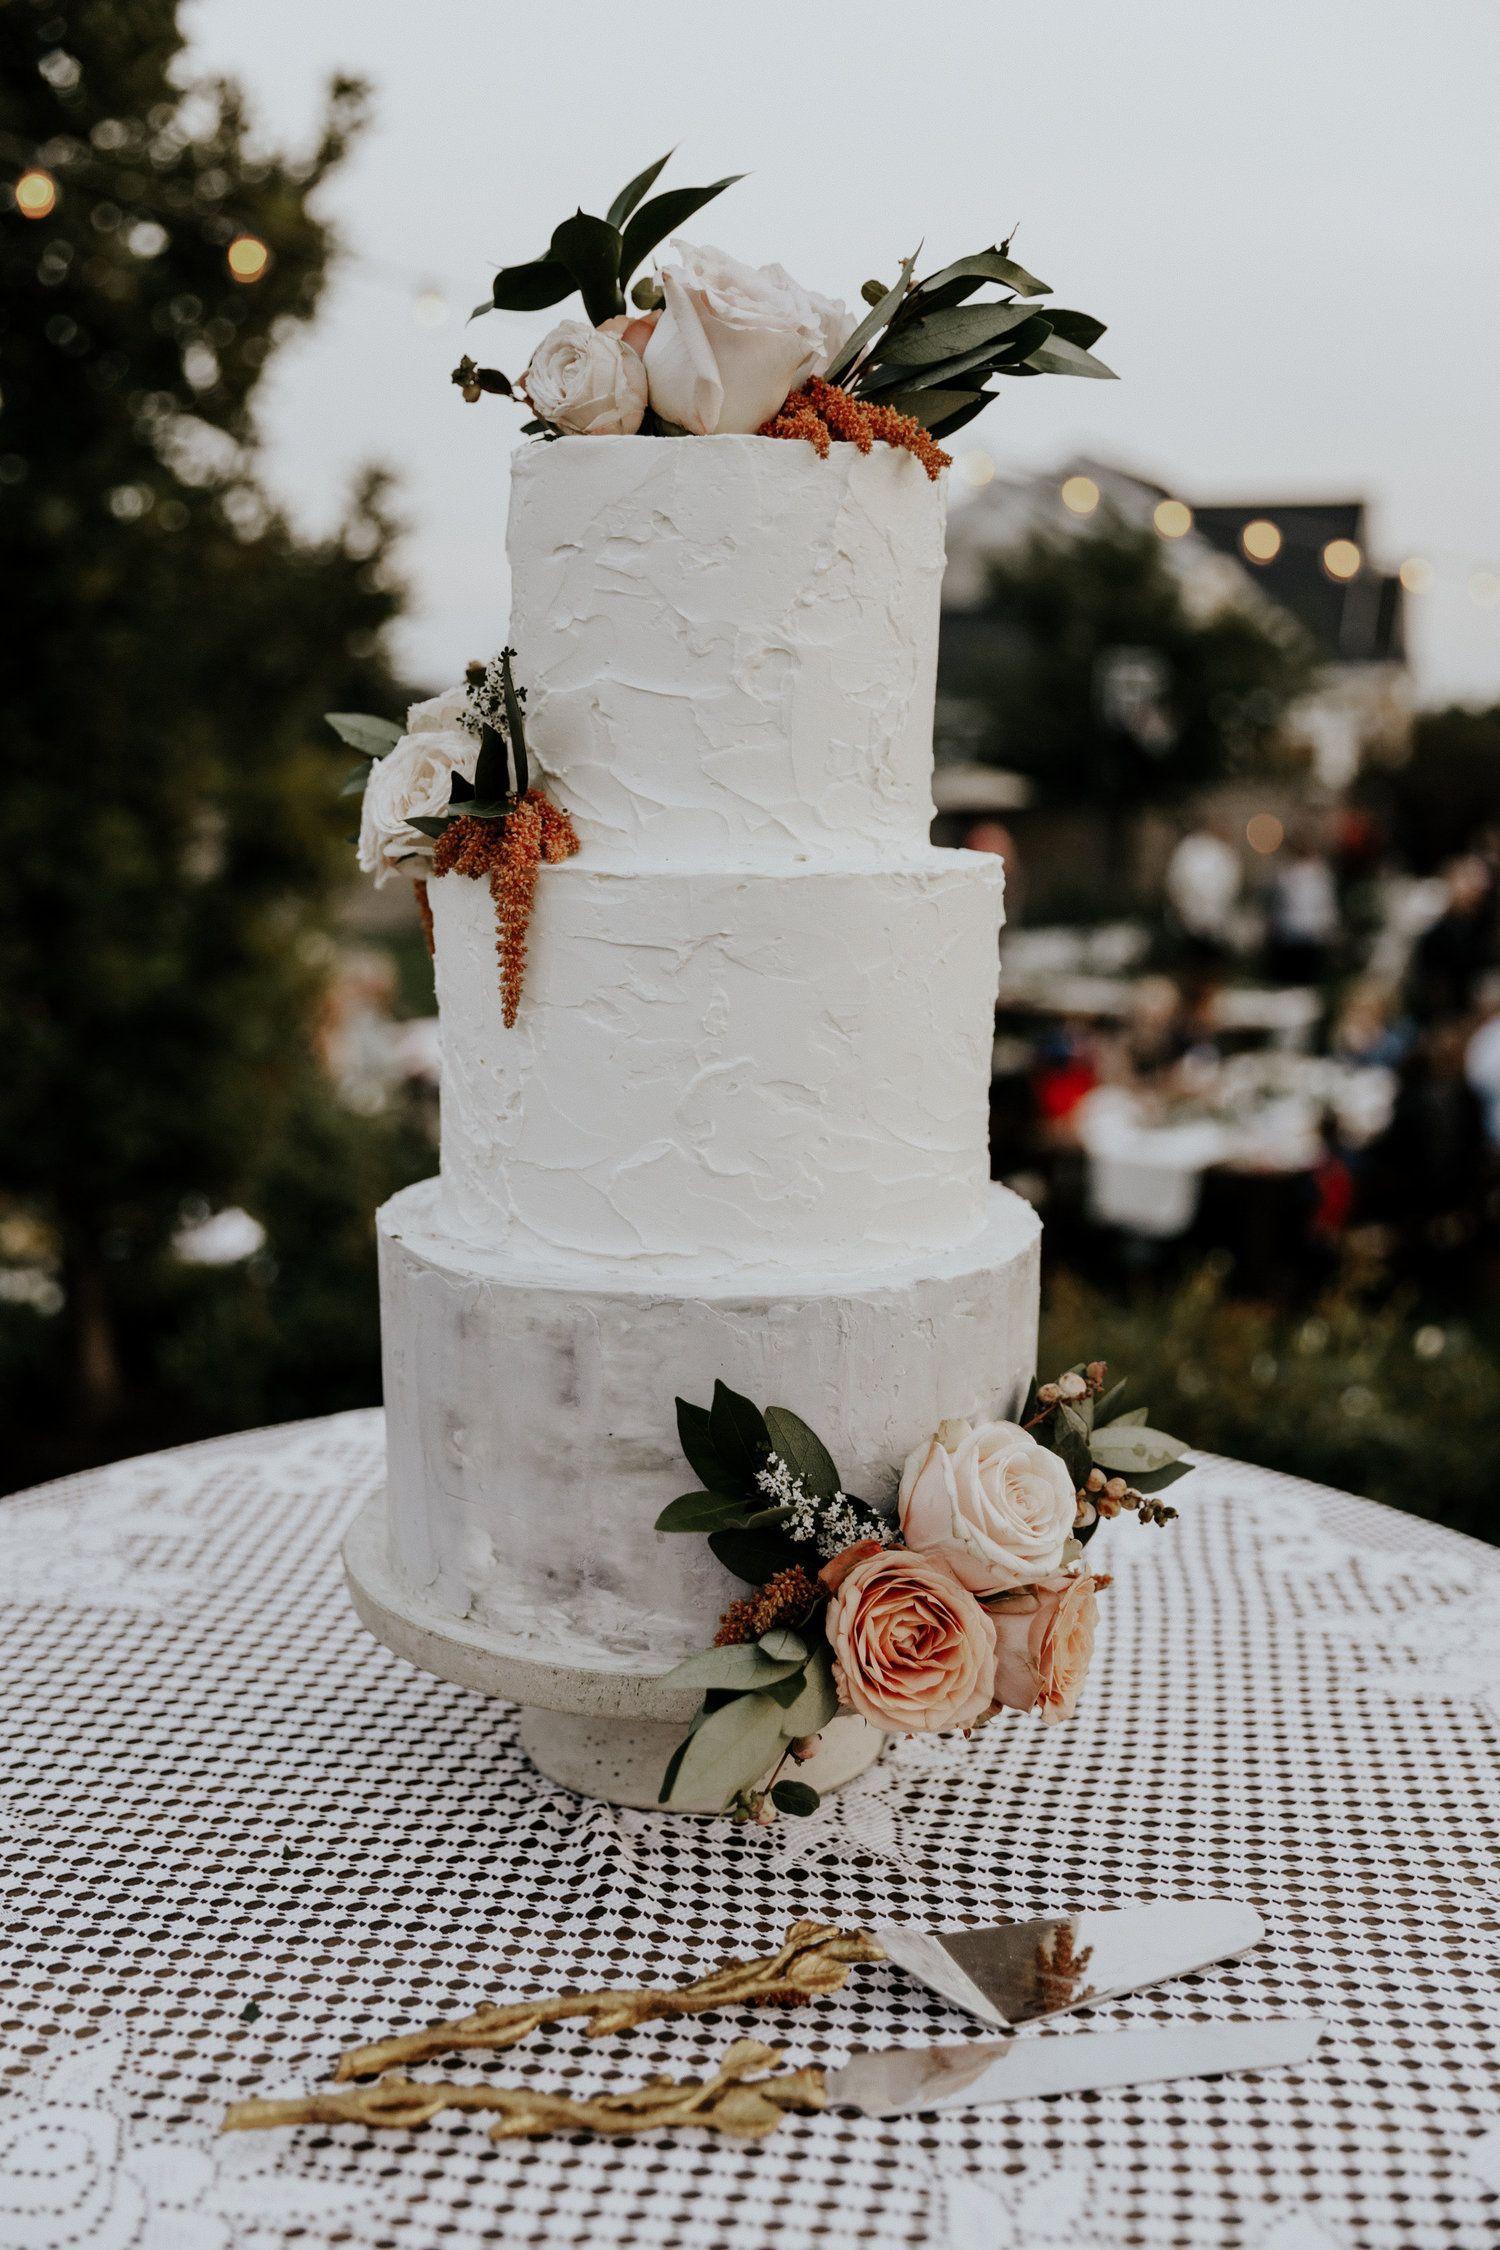 Www Thepottedpansy Com Utah Wedding Cake Floral By The Potted Pansy Floral Wedding Cakes Mexican Wedding Cake Wedding Cake Table